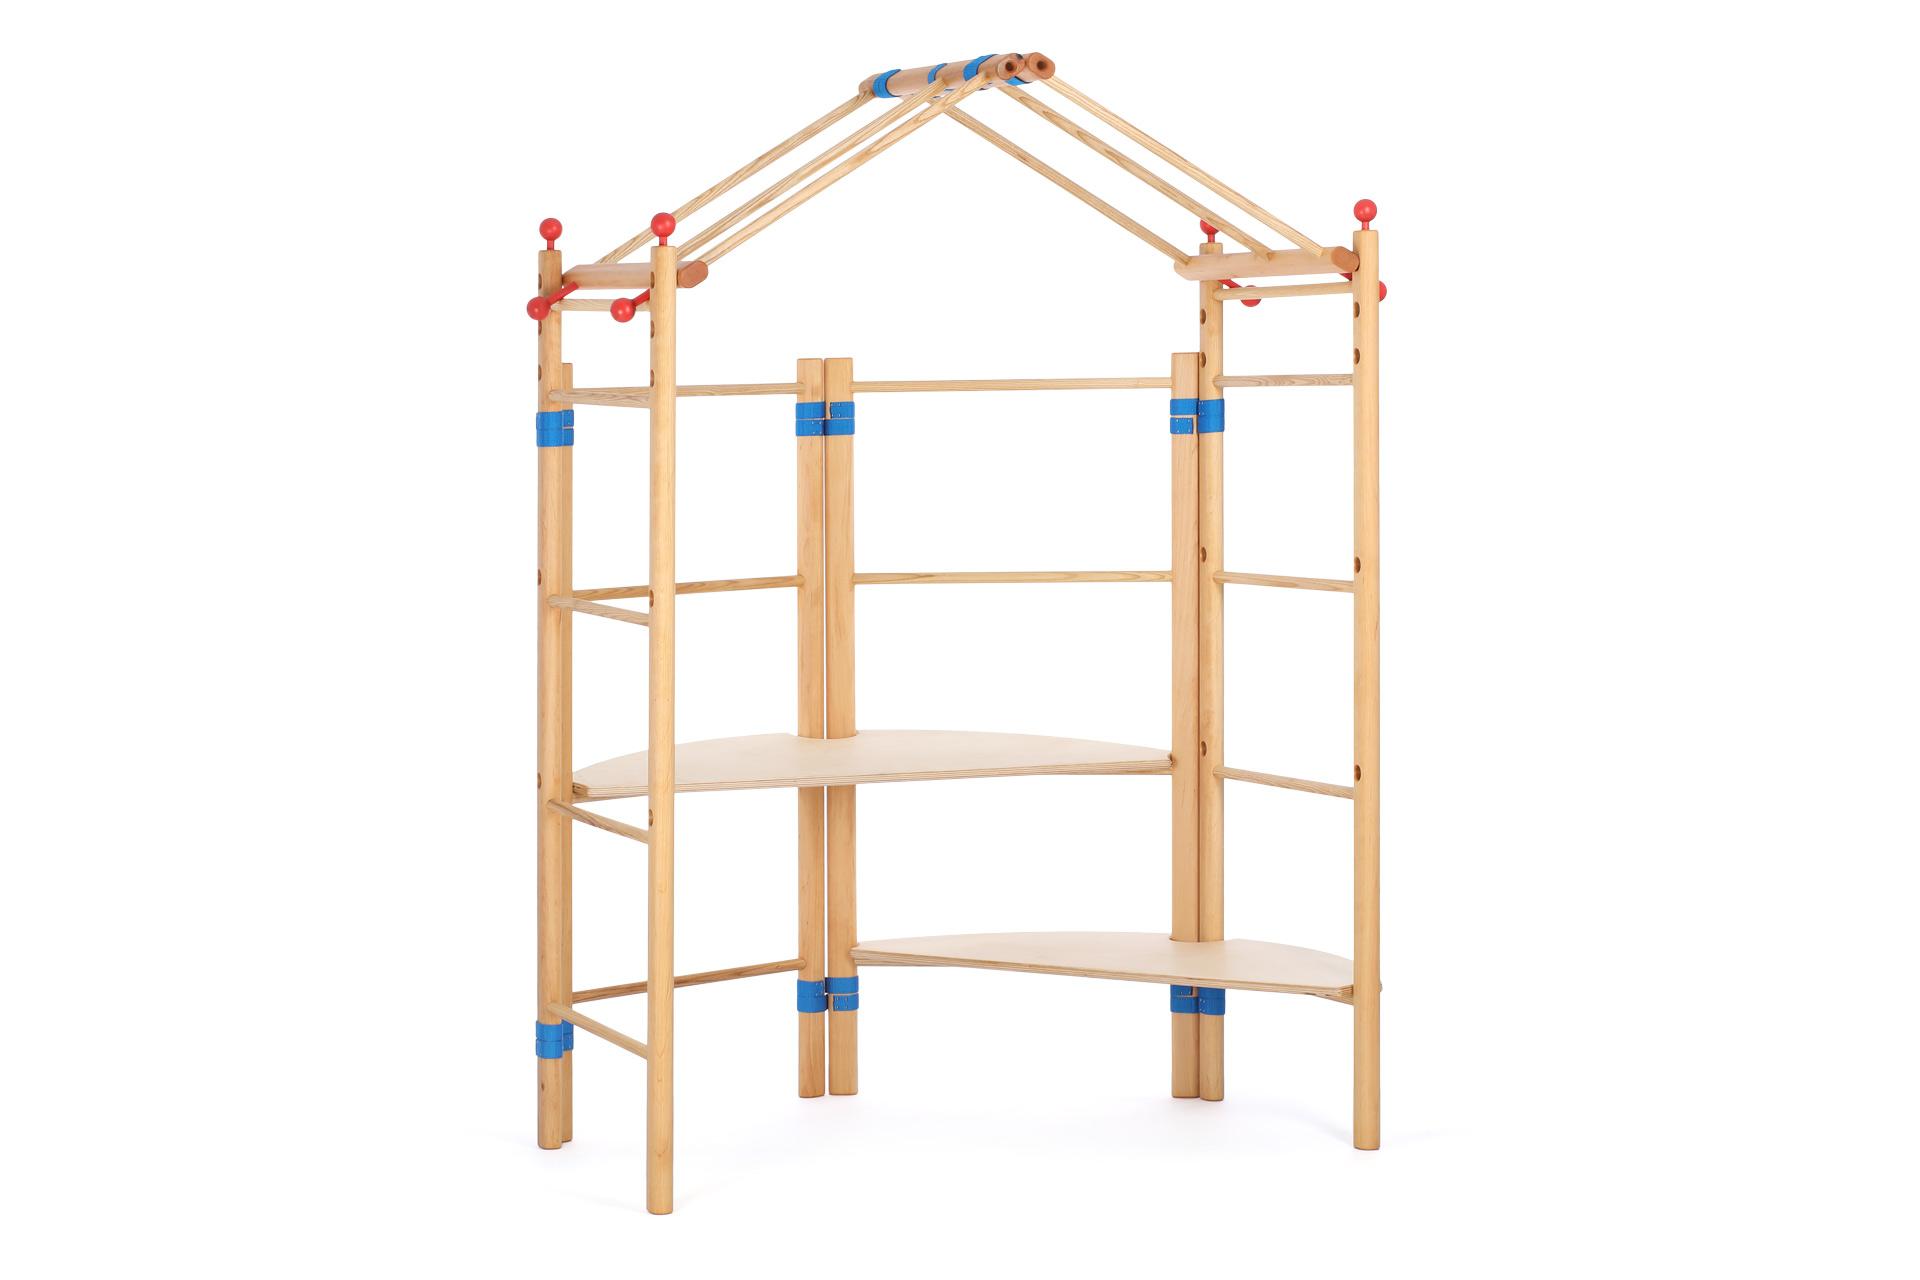 Spielhaus-Set-variabel-aufgebaut-ksg